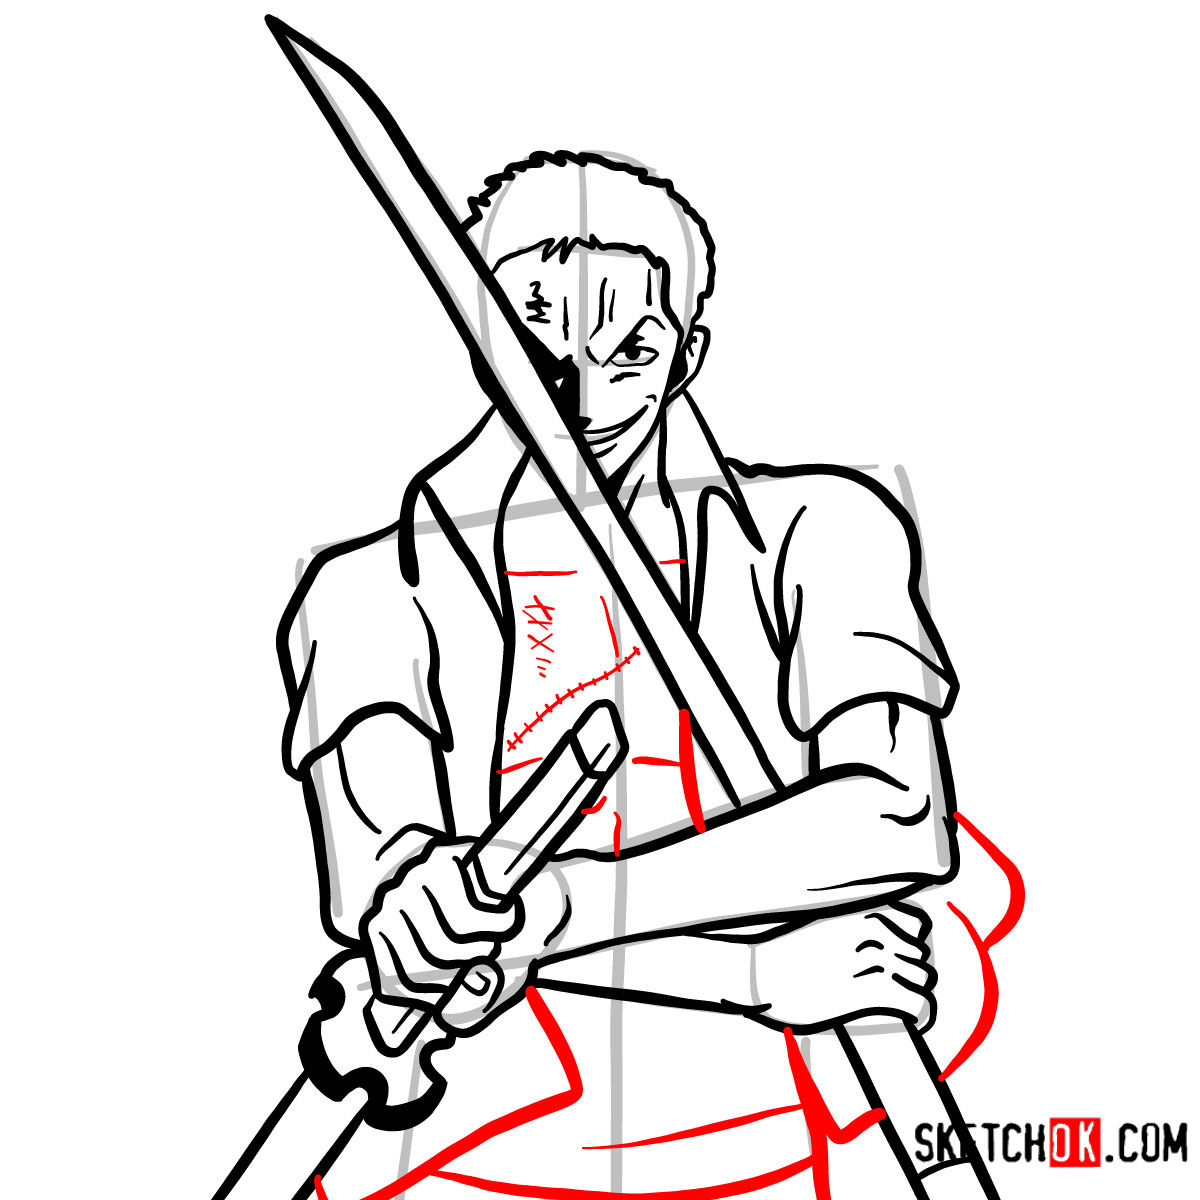 How to draw Roronoa Zoro with swords | One Piece - step 13